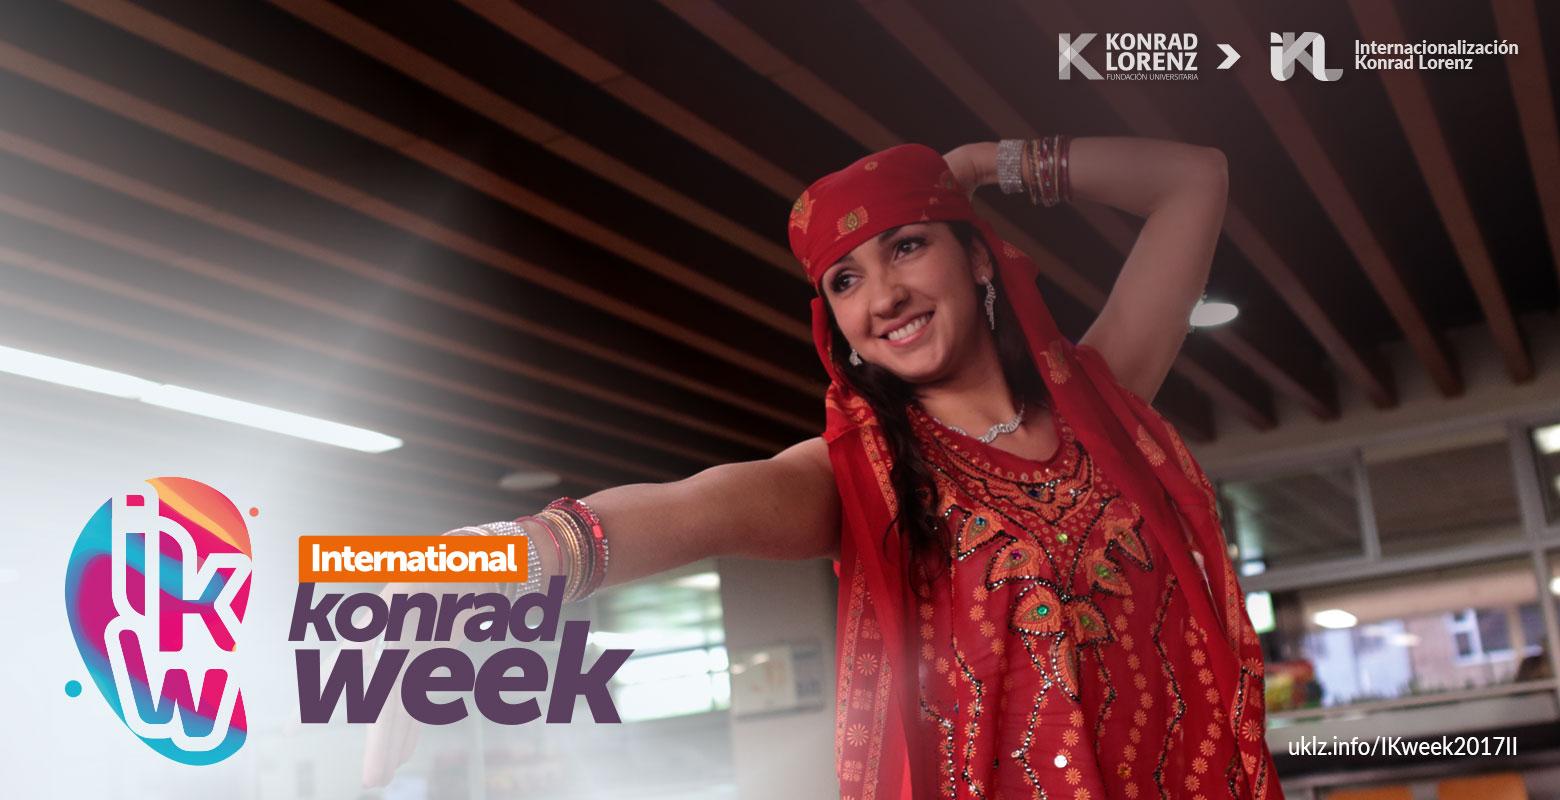 Así fue la VIII International Konrad Week